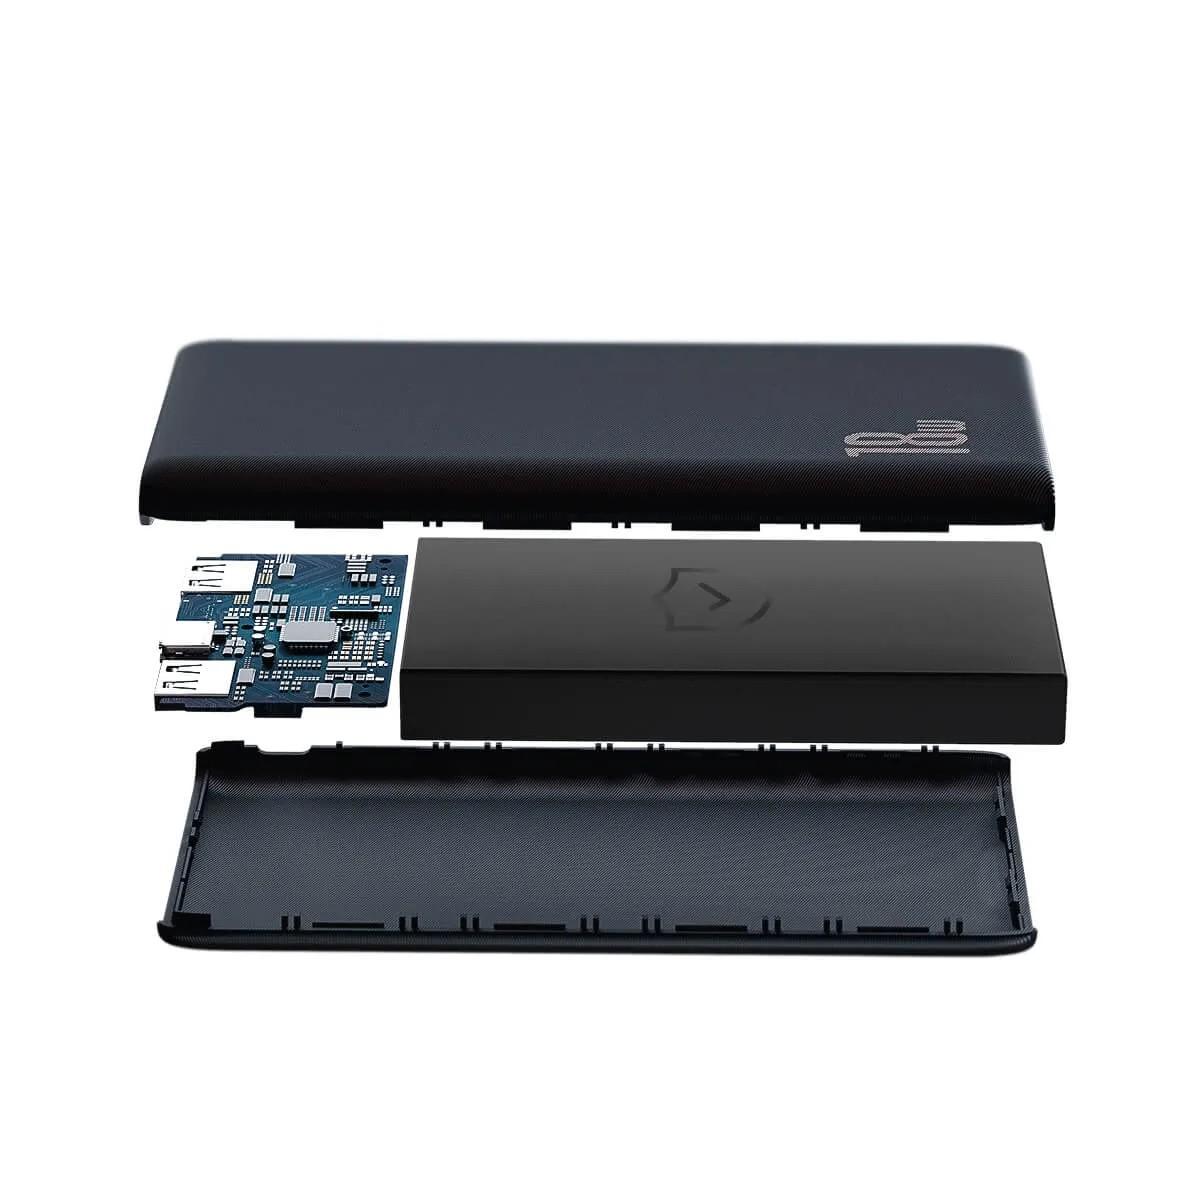 Carregador Portátil Baseus Power bank Bipow 10000mAh PD+QC 18w Preto